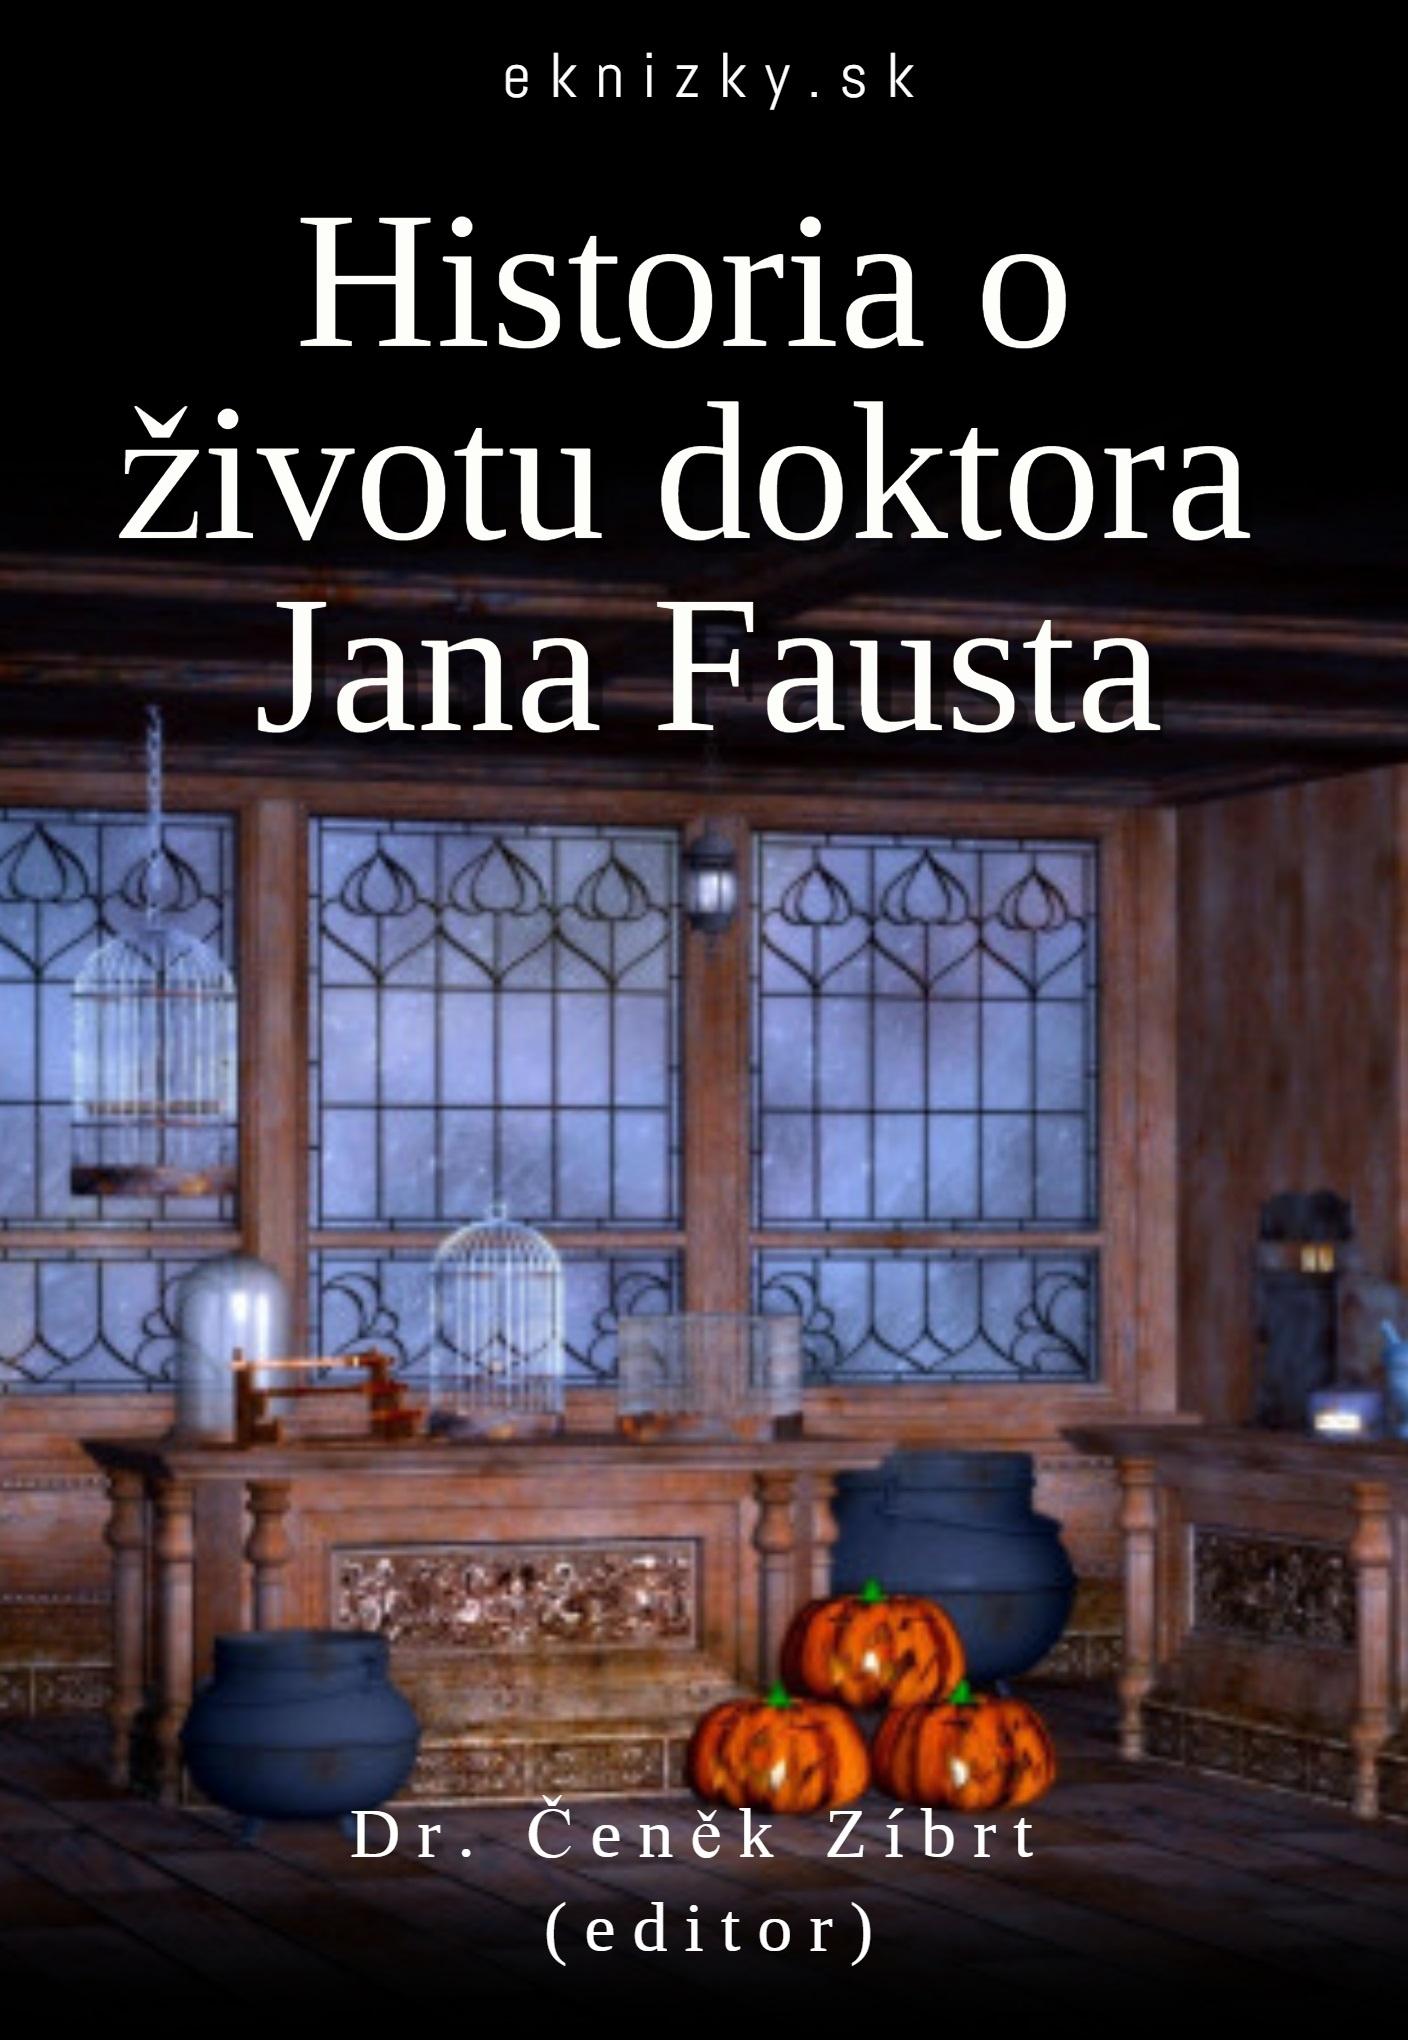 Historia o zivotu doktora Jana Fausta